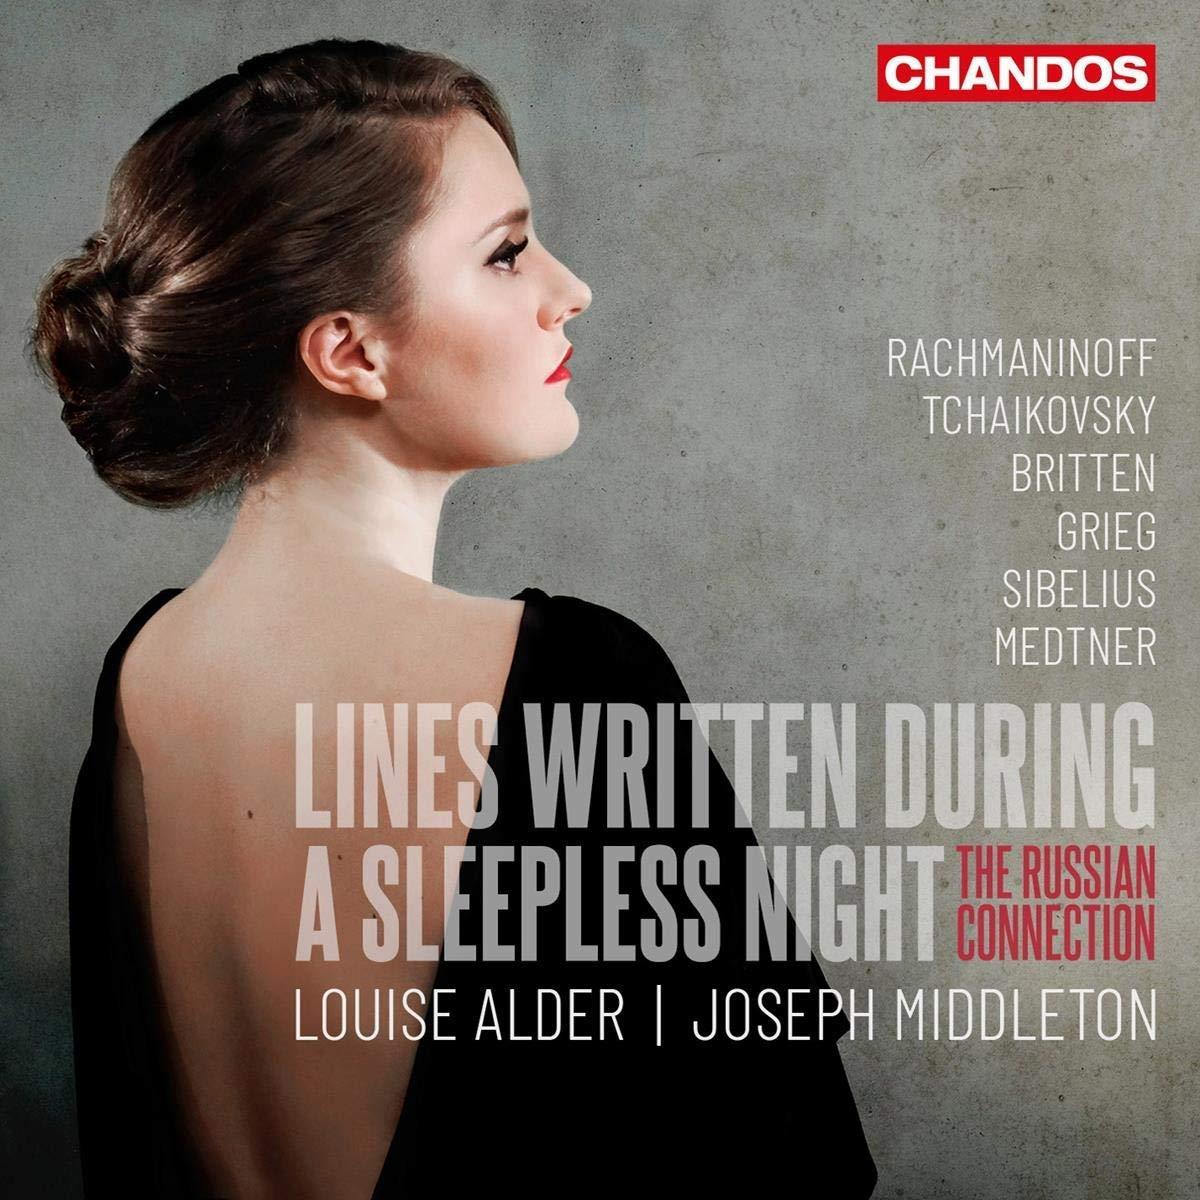 CHAN20153 . Lines Written During a Sleepless Night